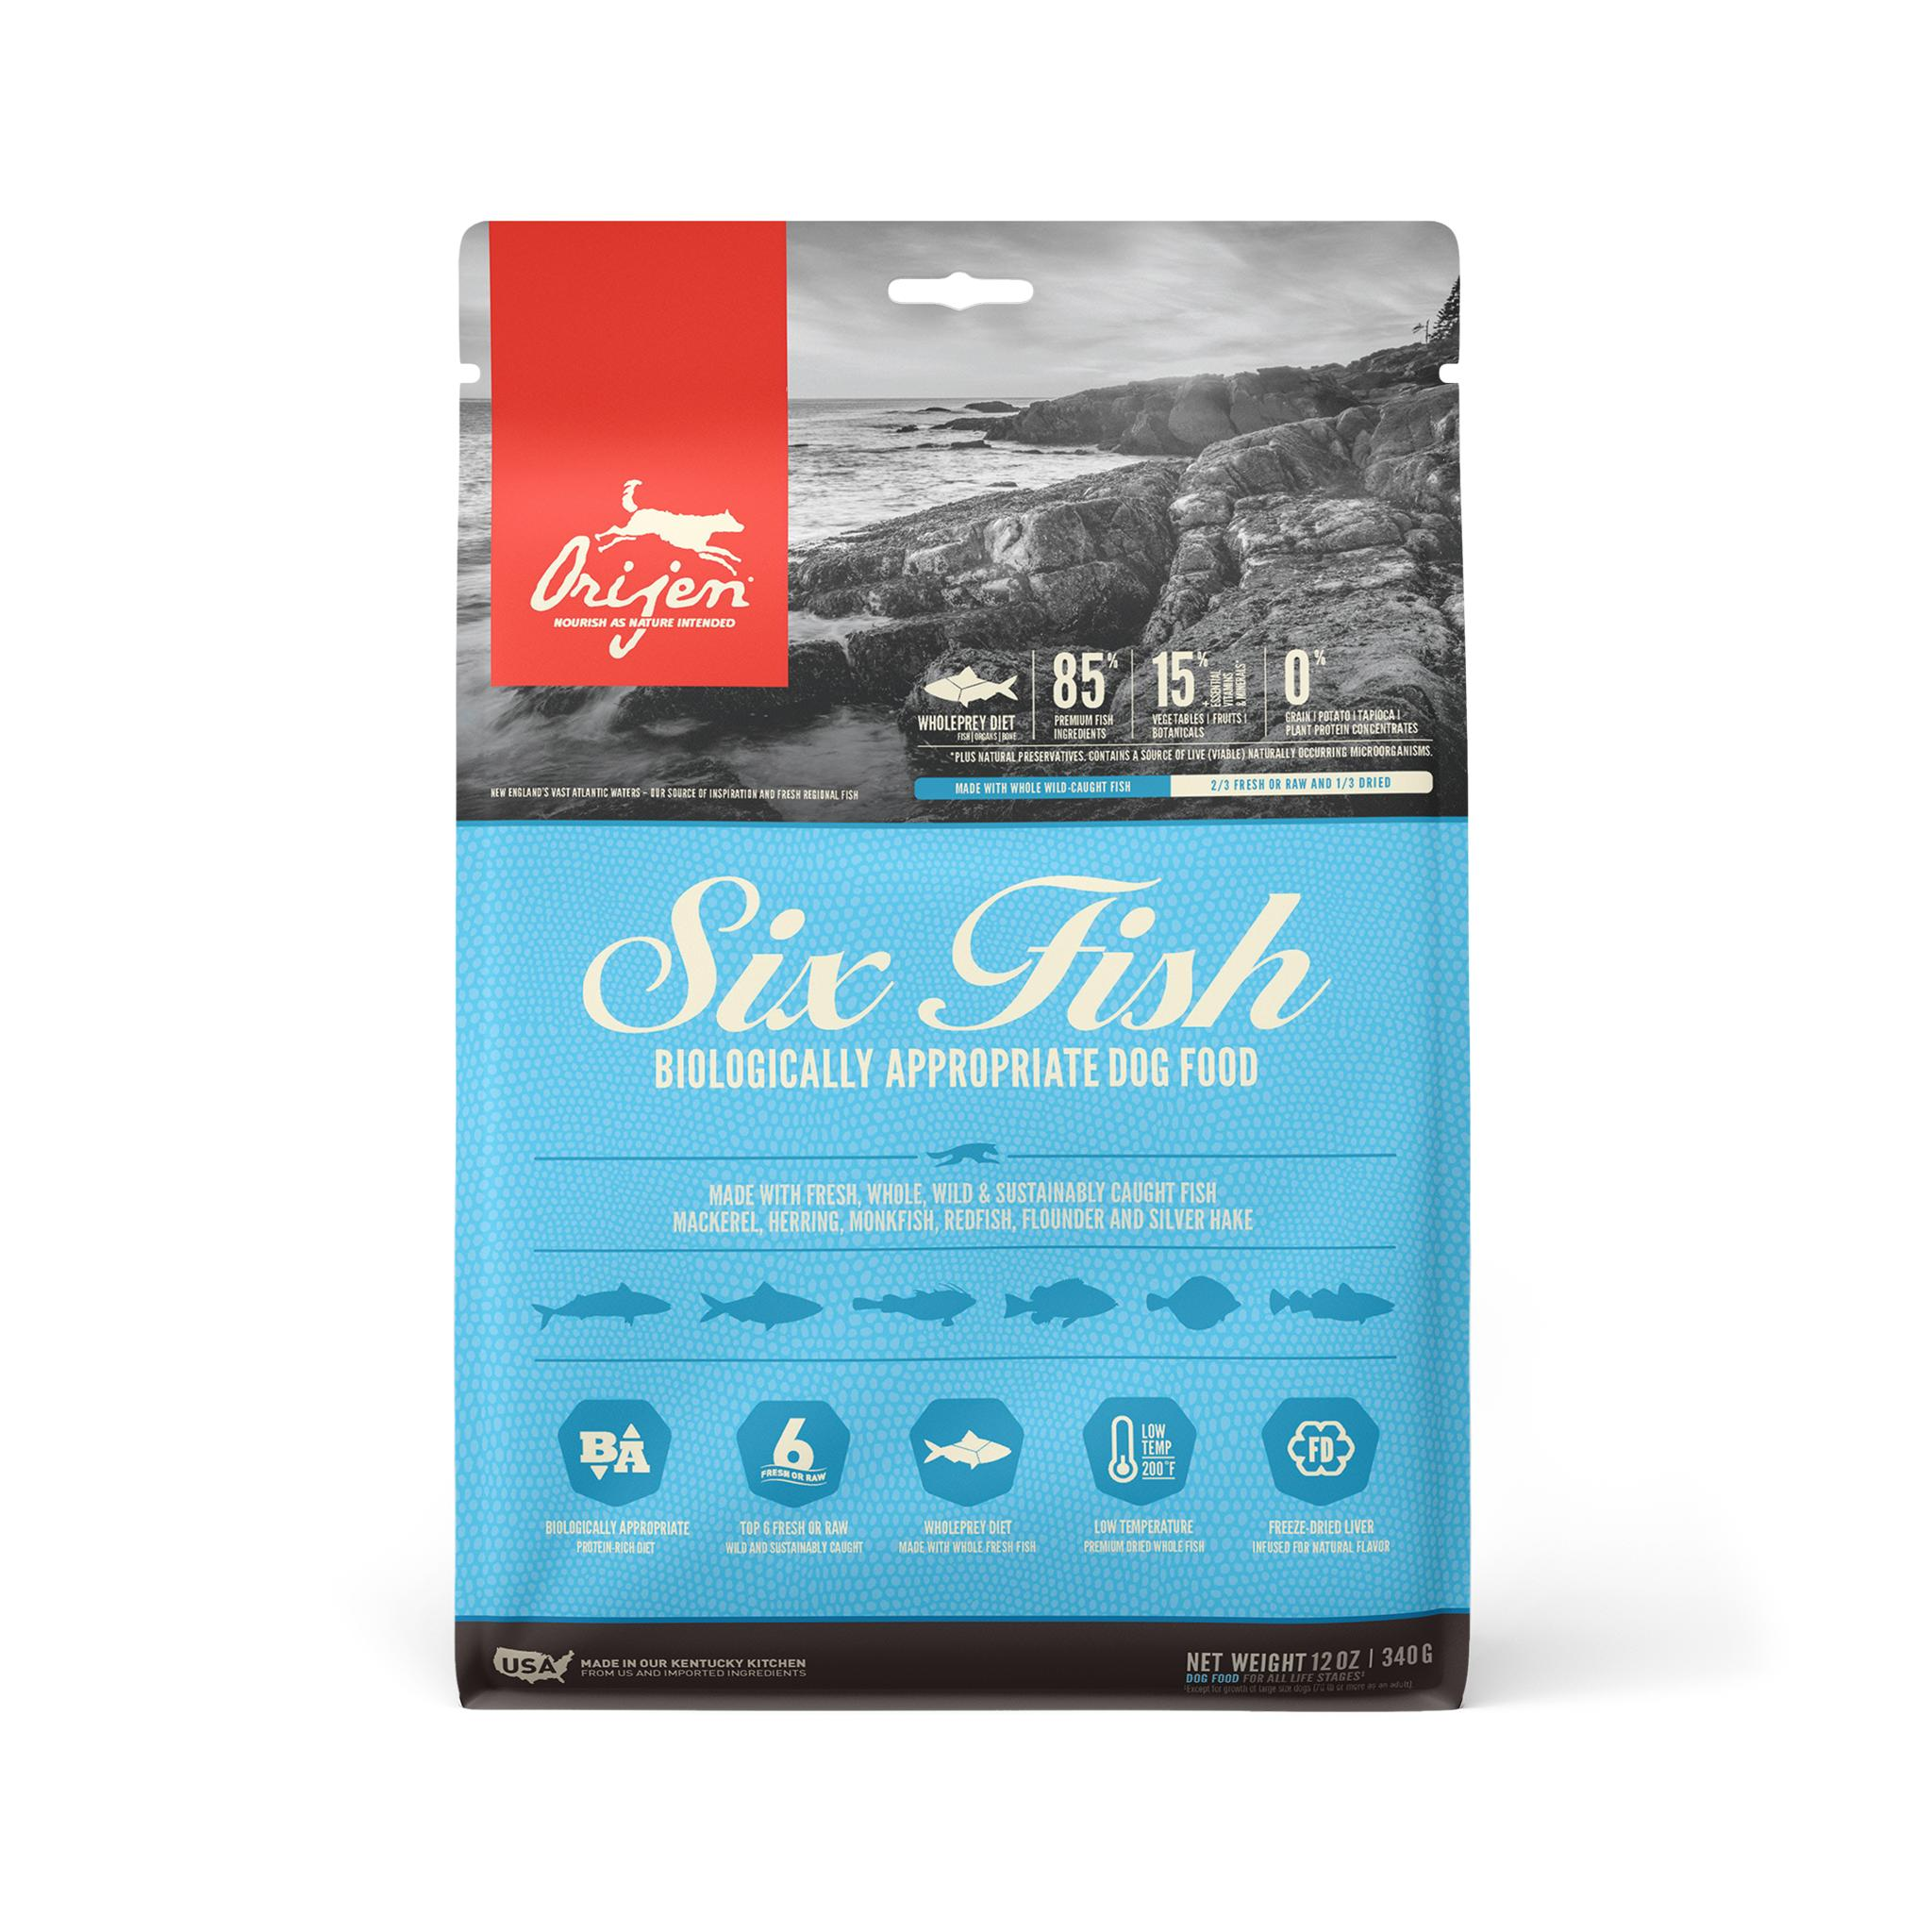 ORIJEN Six Fish Grain-Free Dry Dog Food Image